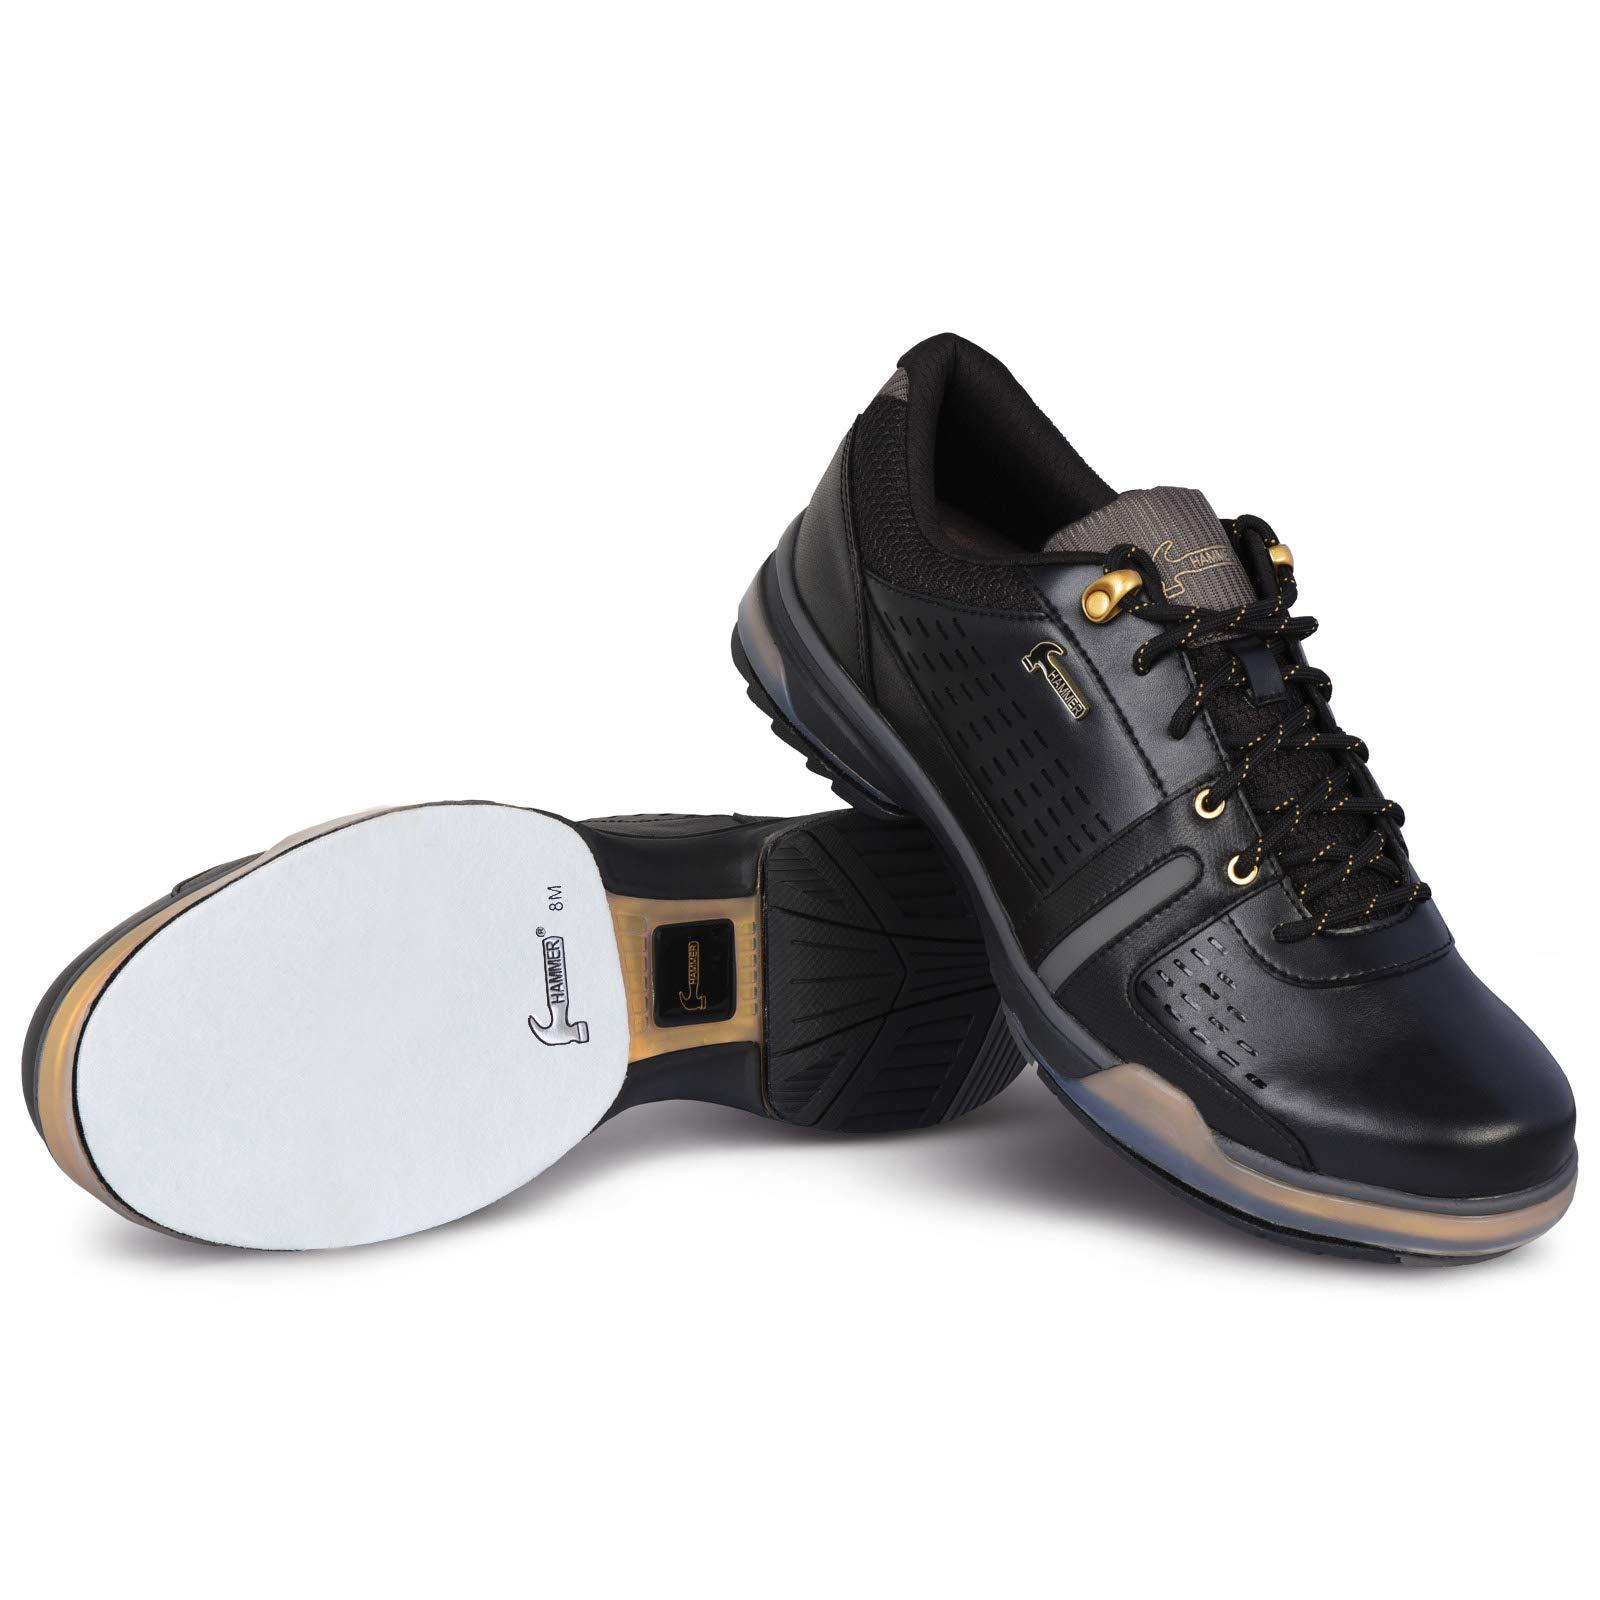 KR Strikeforce Hammer Boss Wide Width Black/Gold Performance Bowling Shoes Men's Size 11